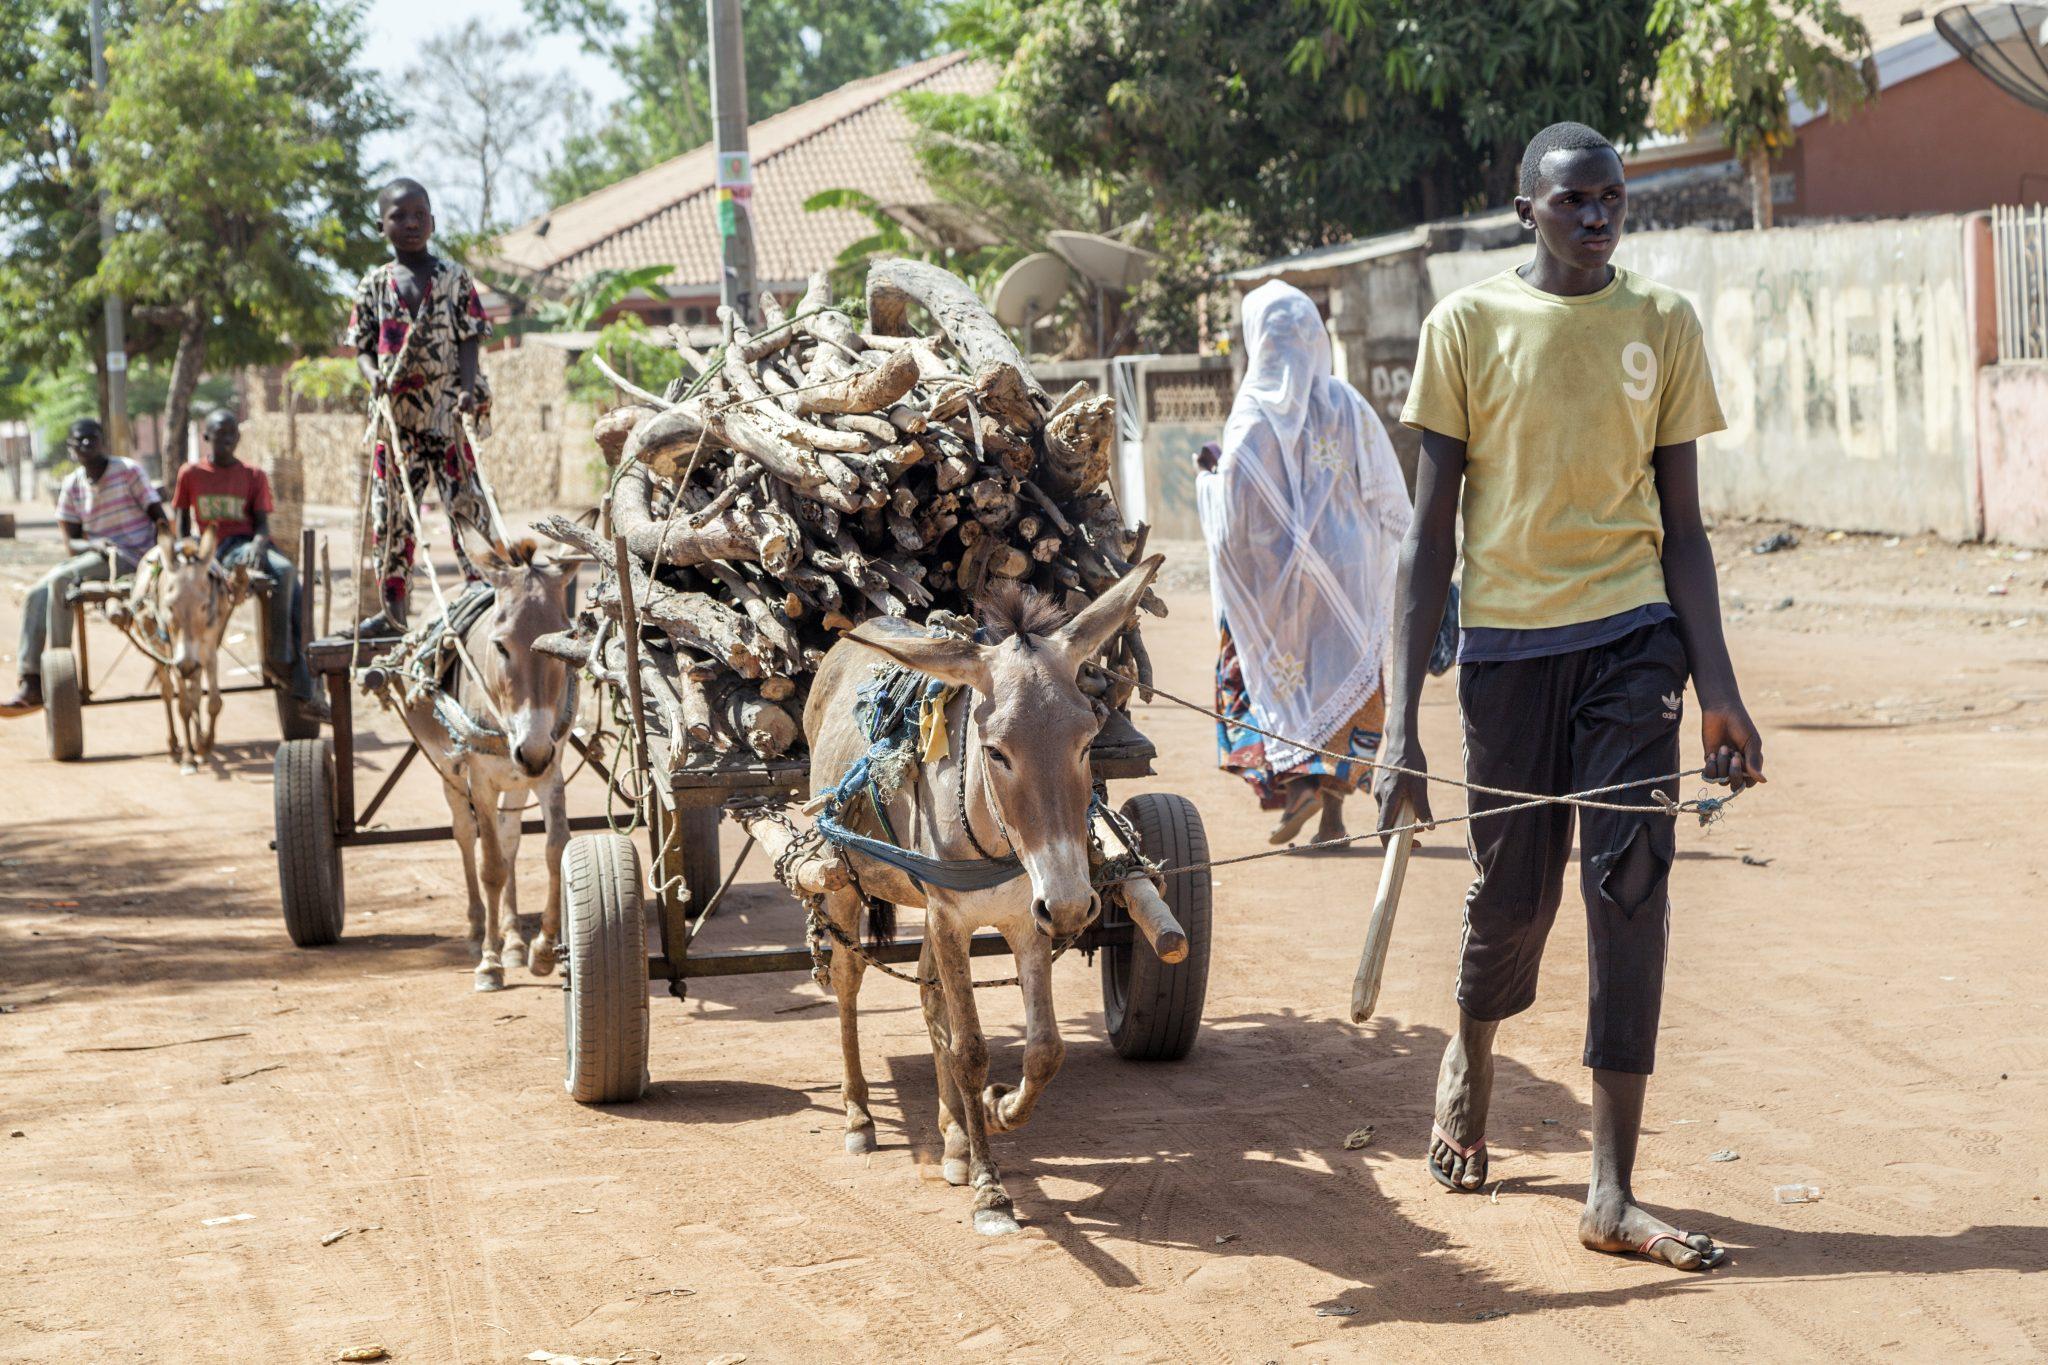 Esel Westafrika Transportmittel